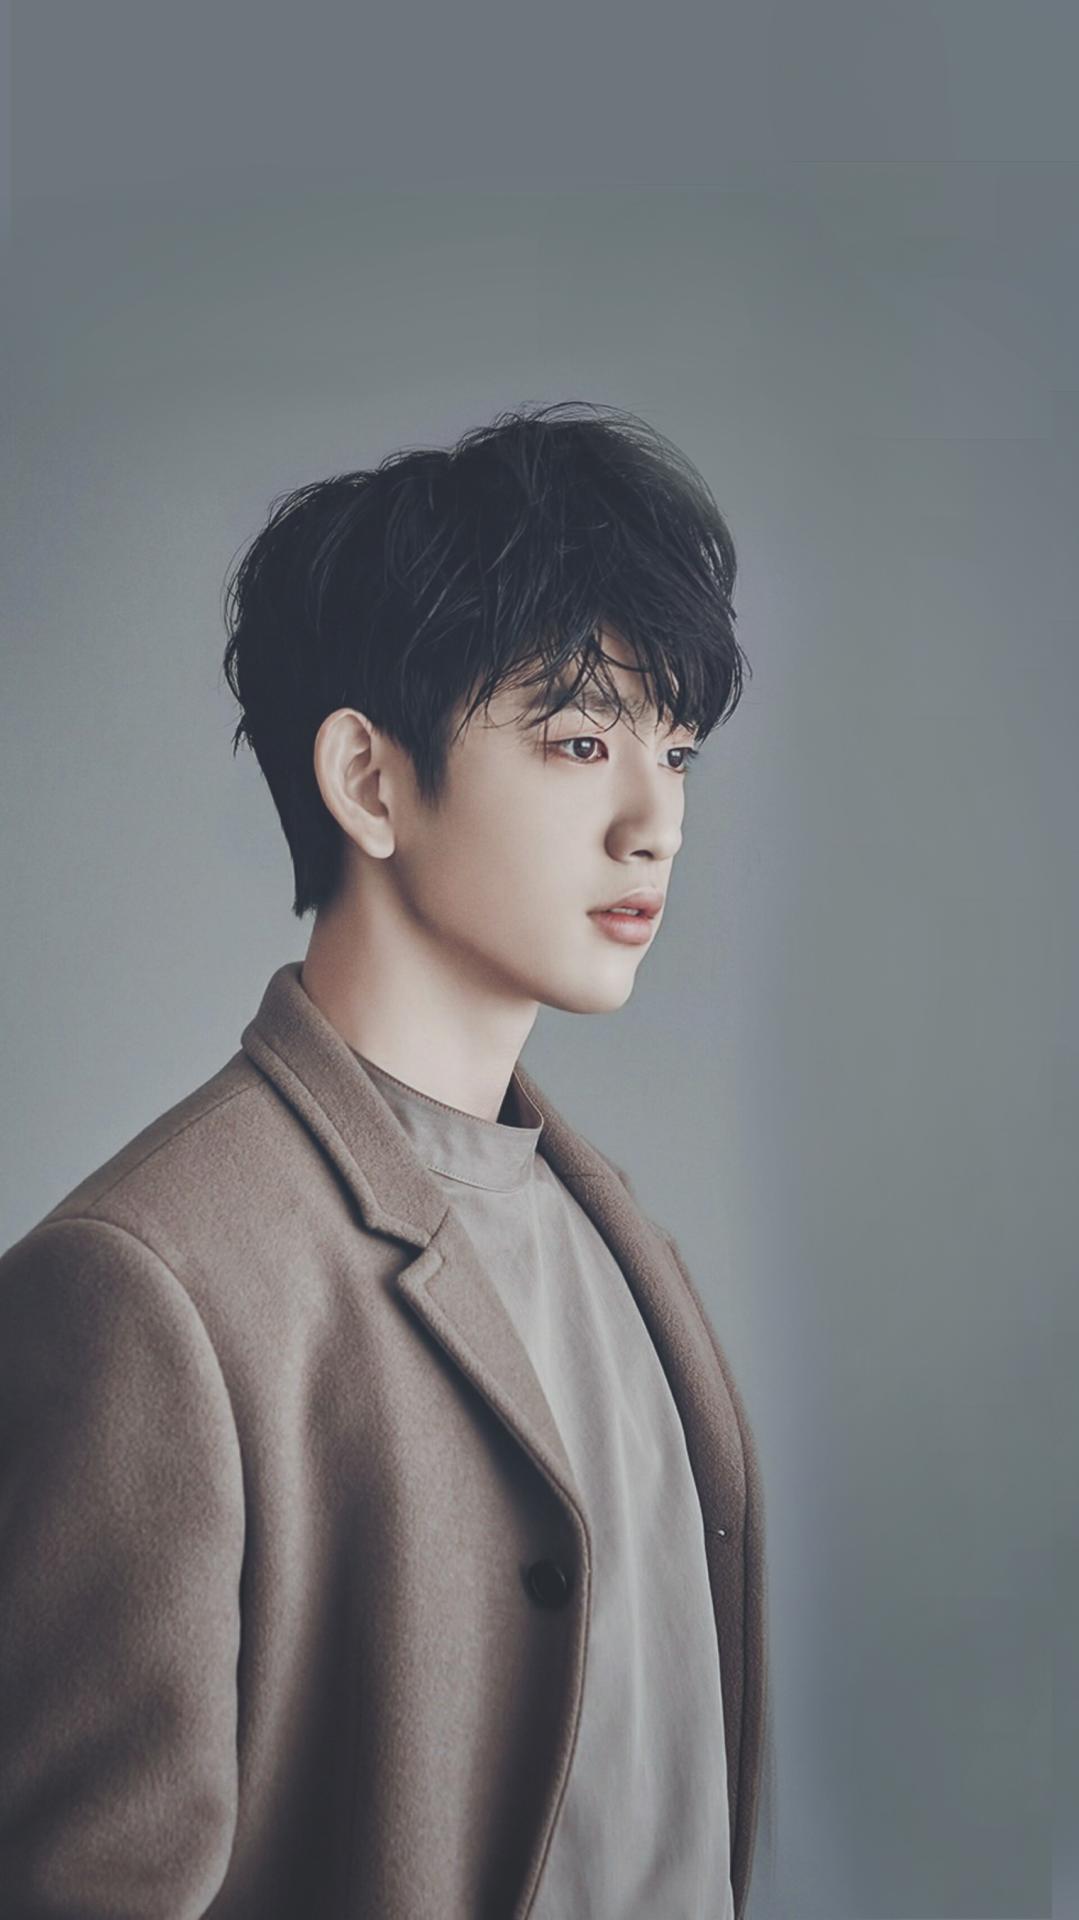 jinyoung wallpaper | Tumblr | 진영 | Pinterest | Got7 ...